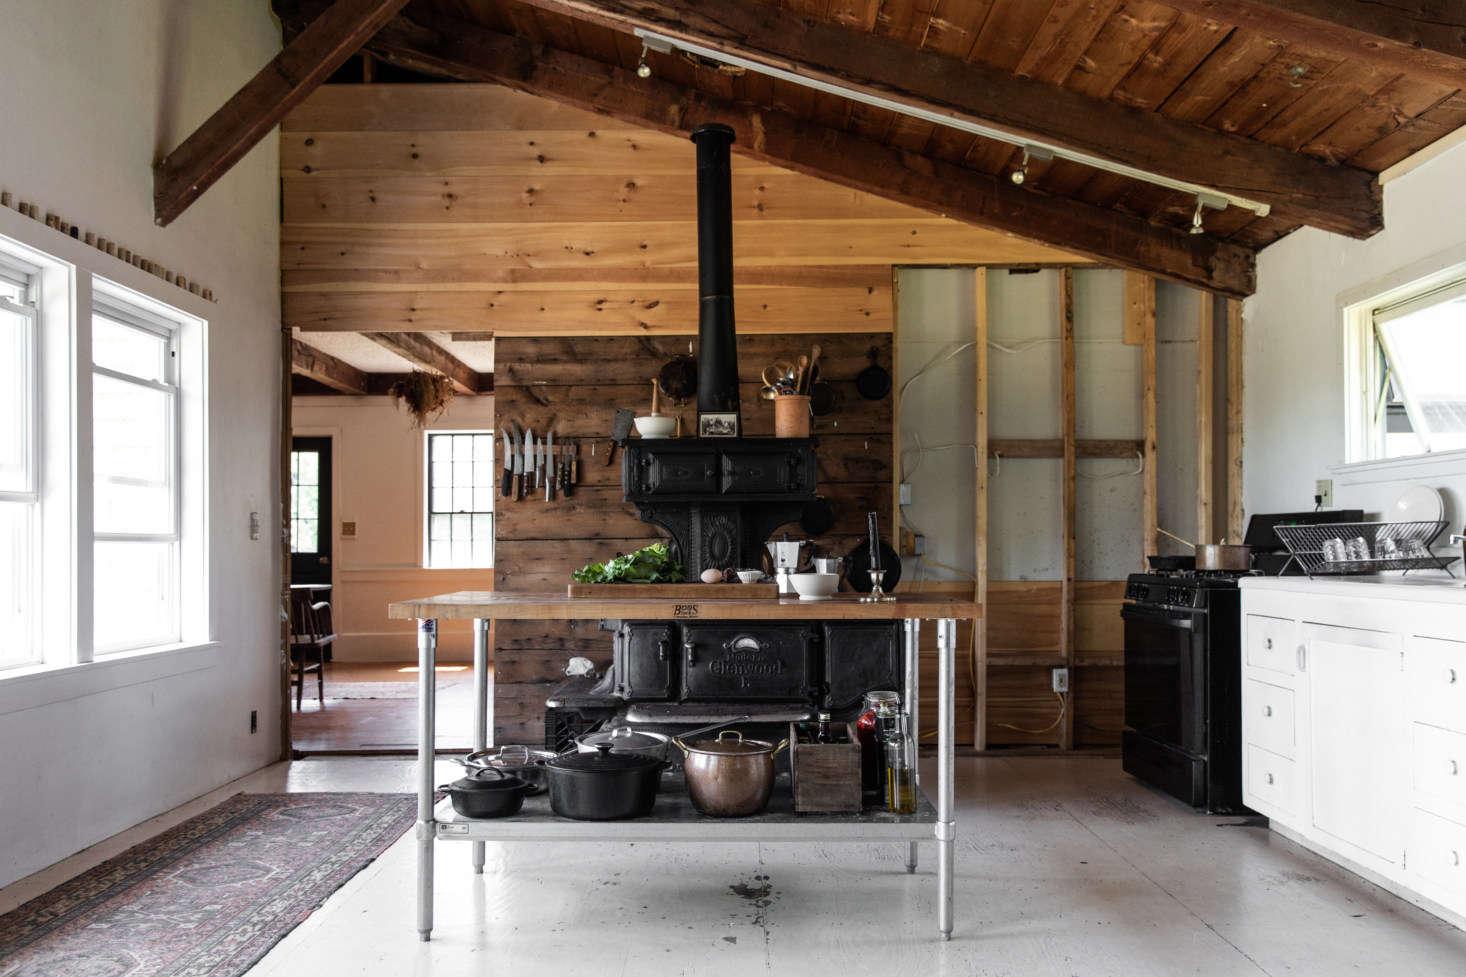 The House That Craigslist Built: A Bare-Bones Farmhouse in Midcoast ...